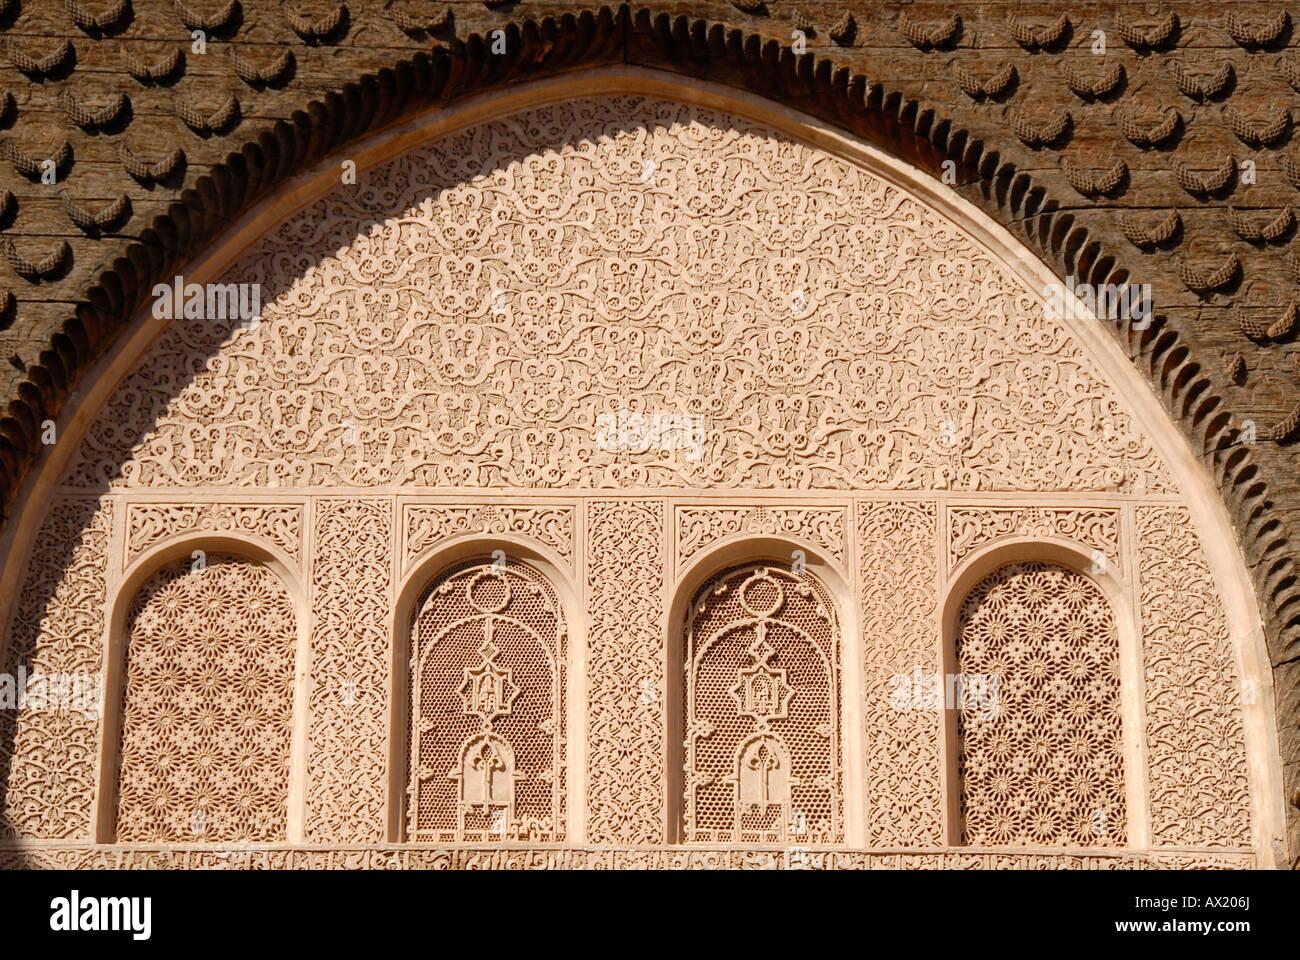 Oriental windows with fine stucco richly decorated Medersa Ali Ben Youssef medina Marrakech Morocco Stock Photo